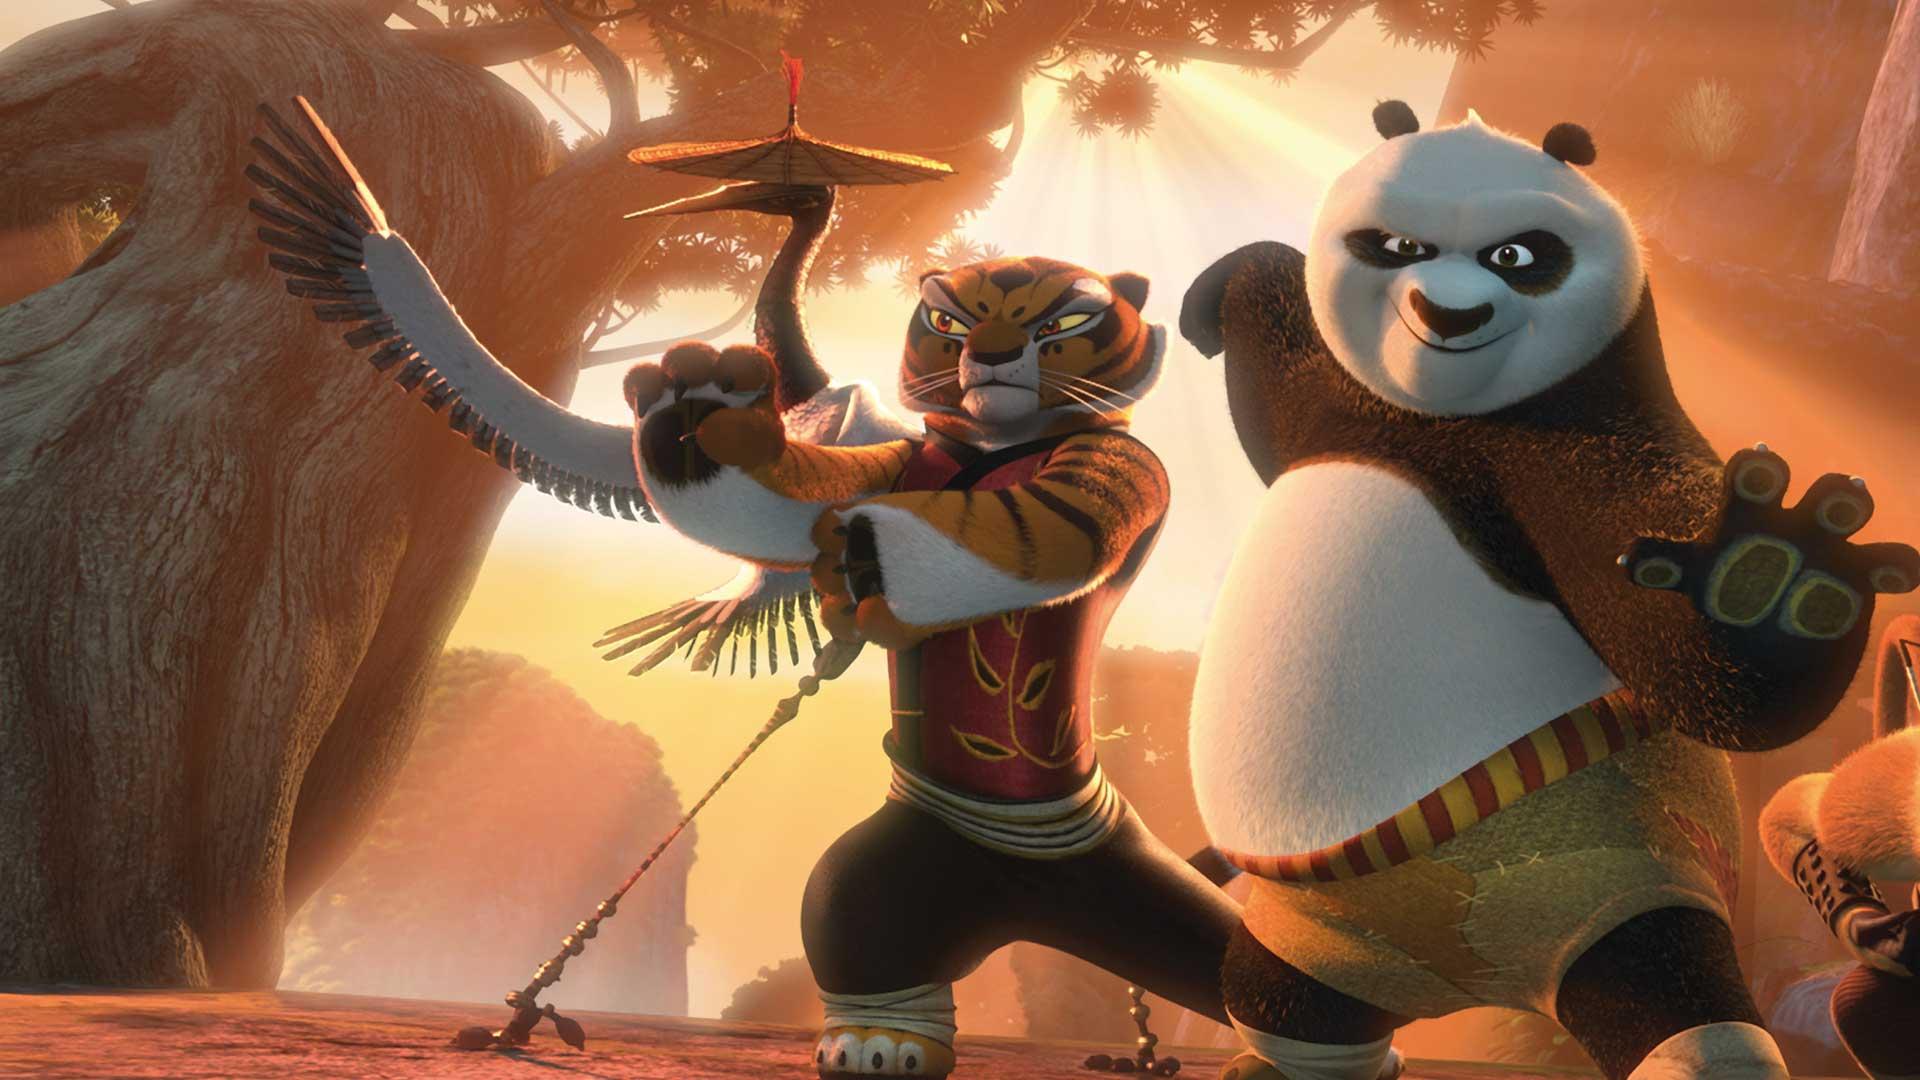 Watch Kung Fu Panda 2 Prime Video